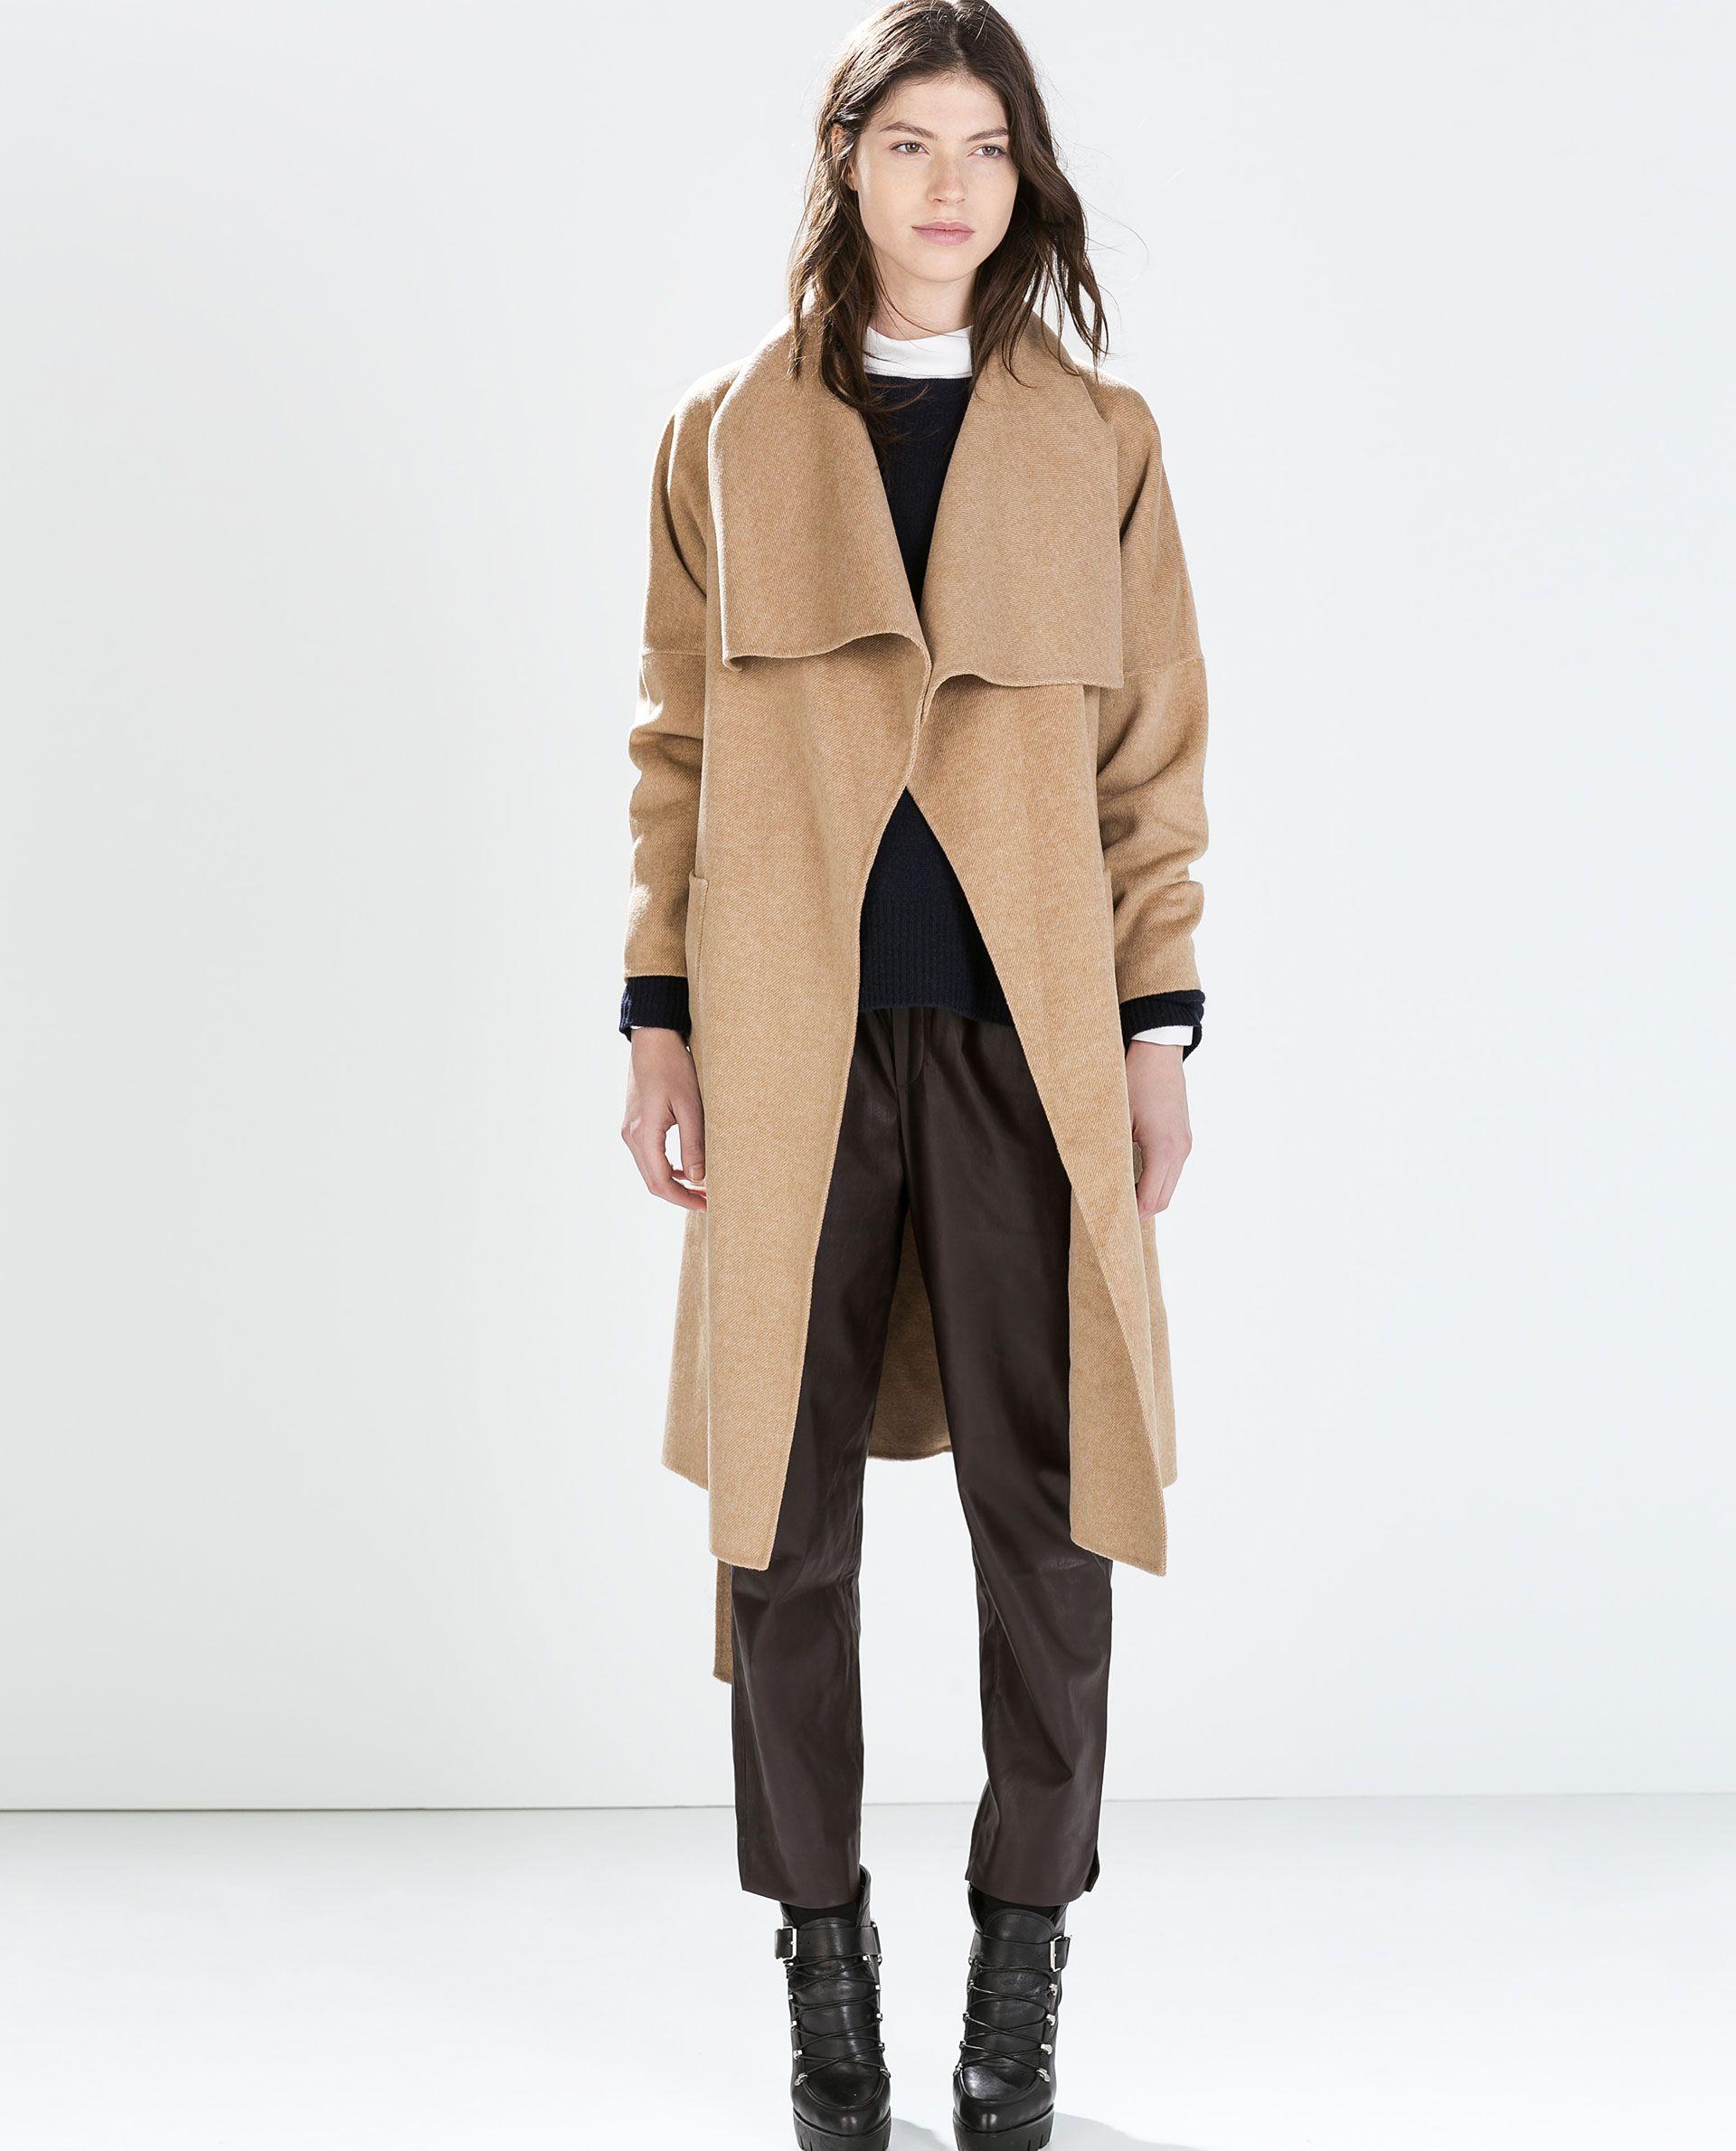 camel coat // LONG COAT from Zara | My Dream Closet | Pinterest ...